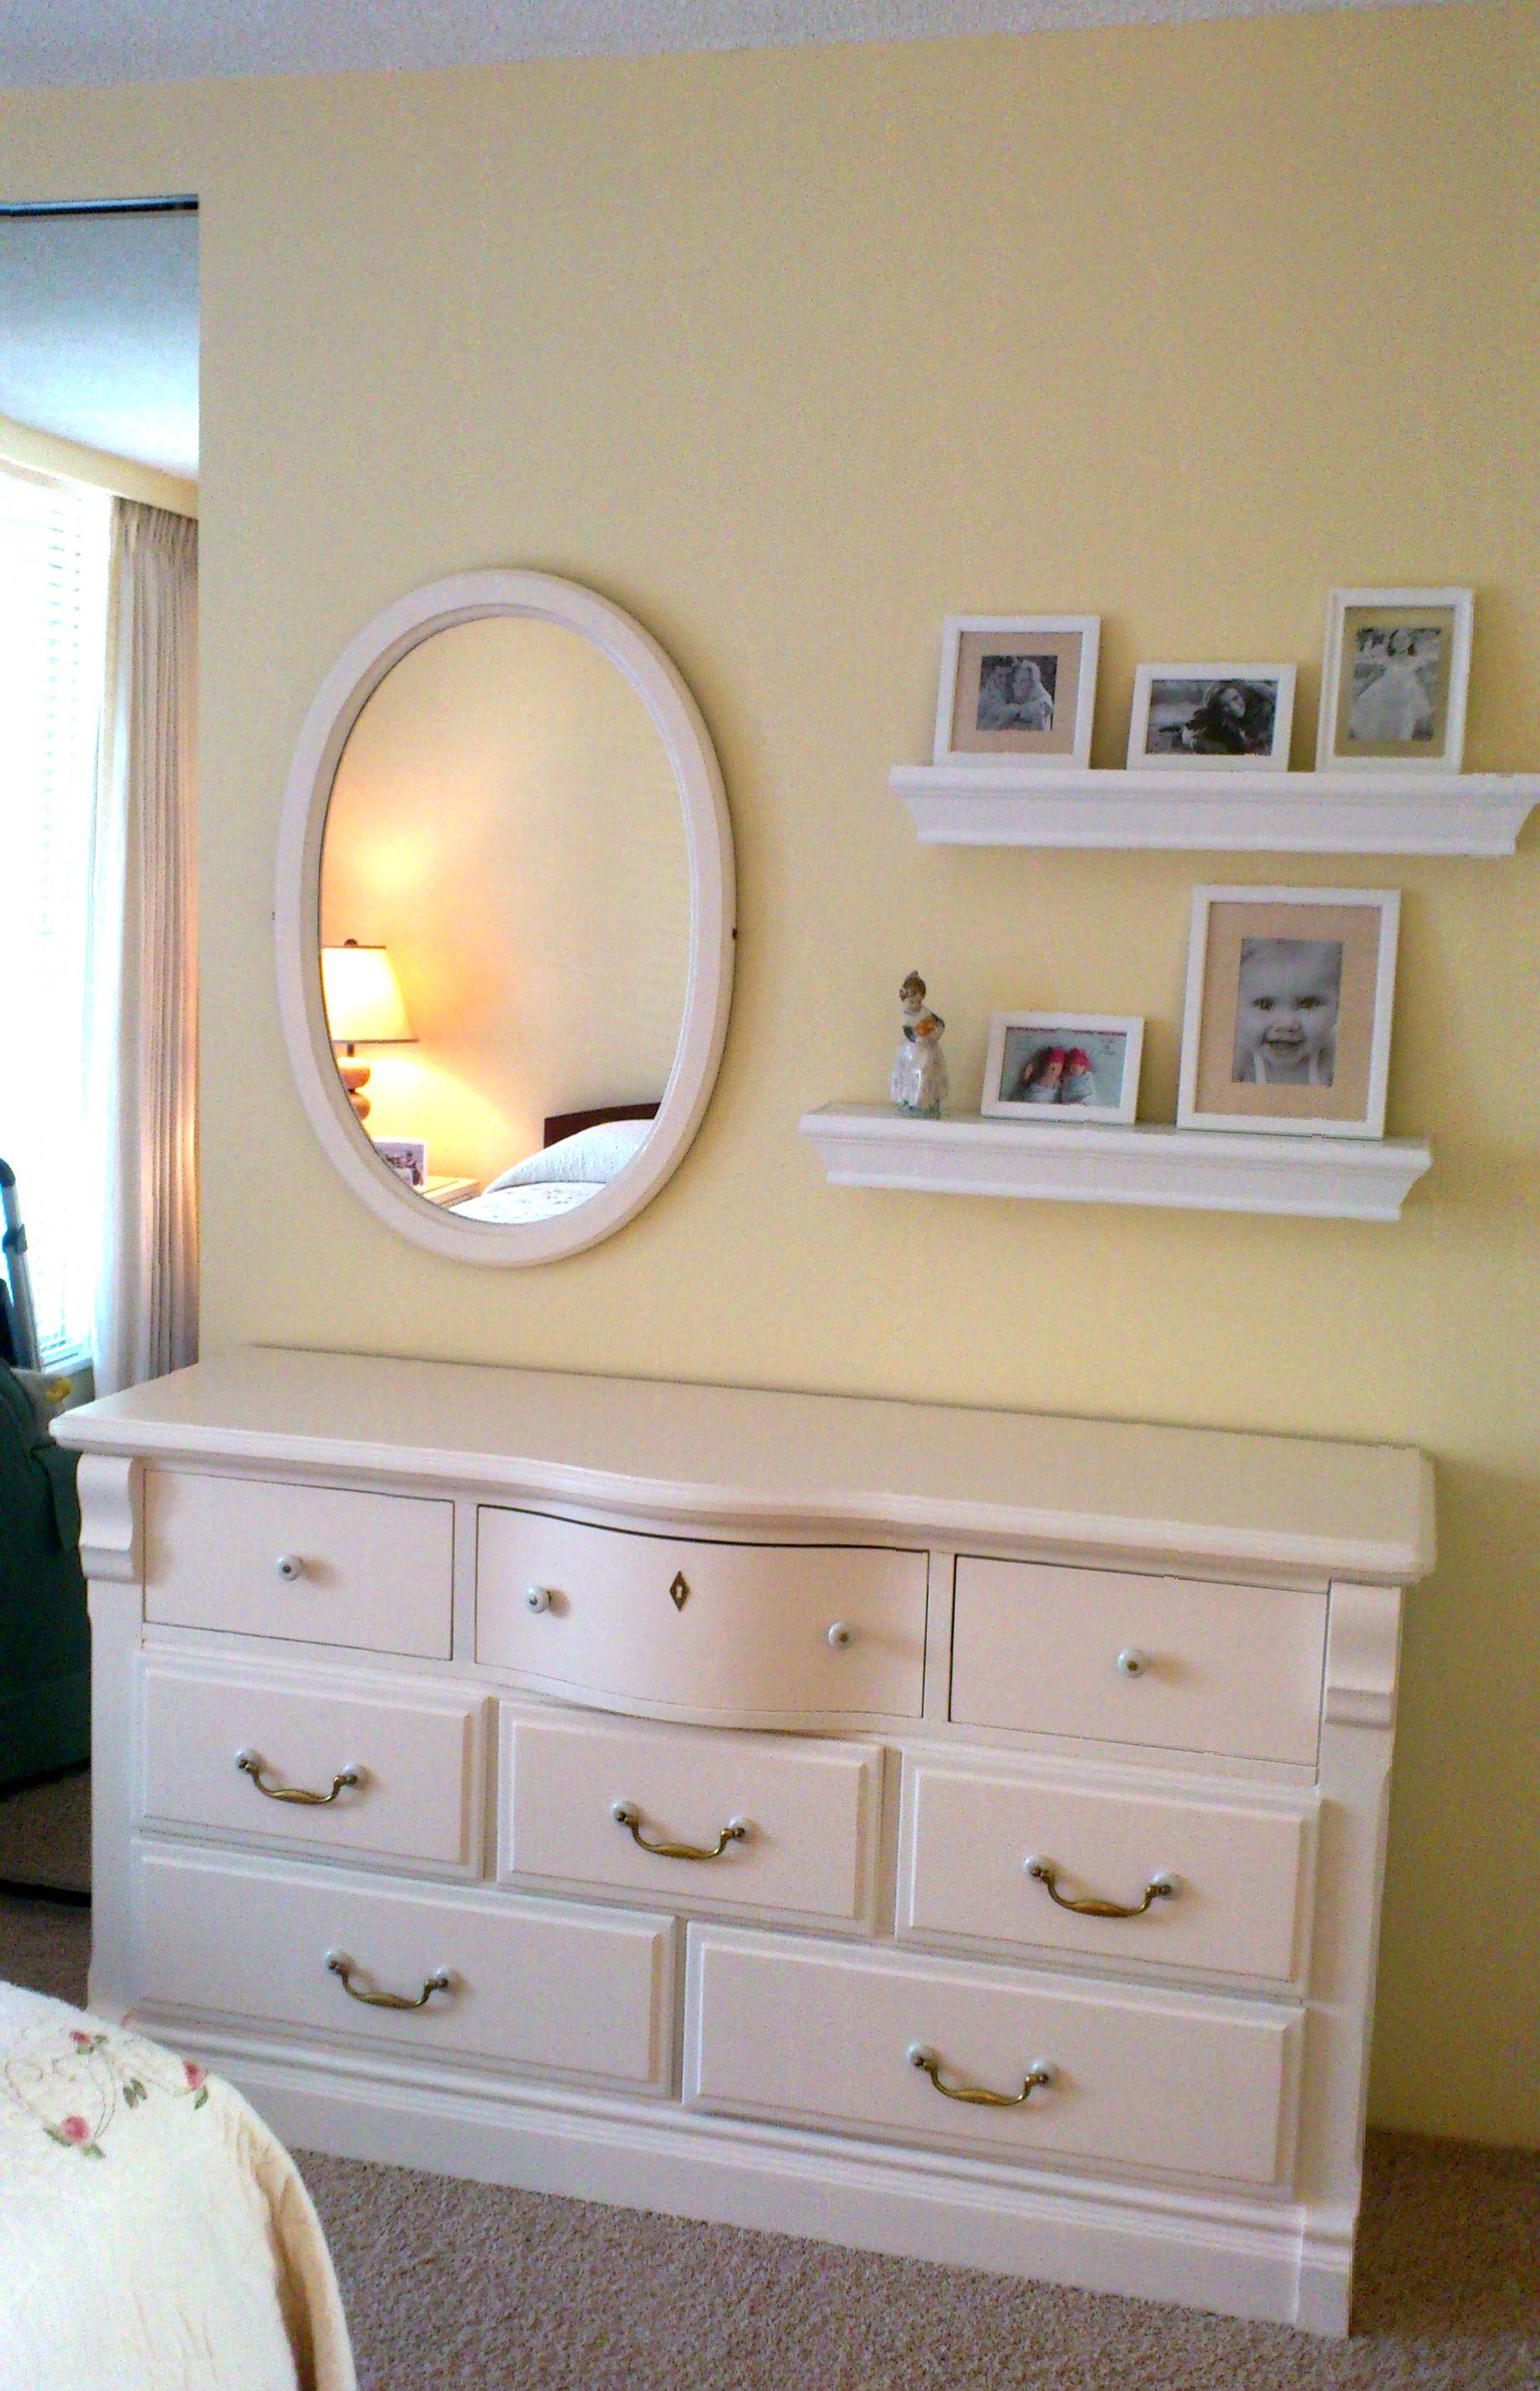 Mirror Shelves Over Dresser Outdoor Wall Decor Temporary Wall